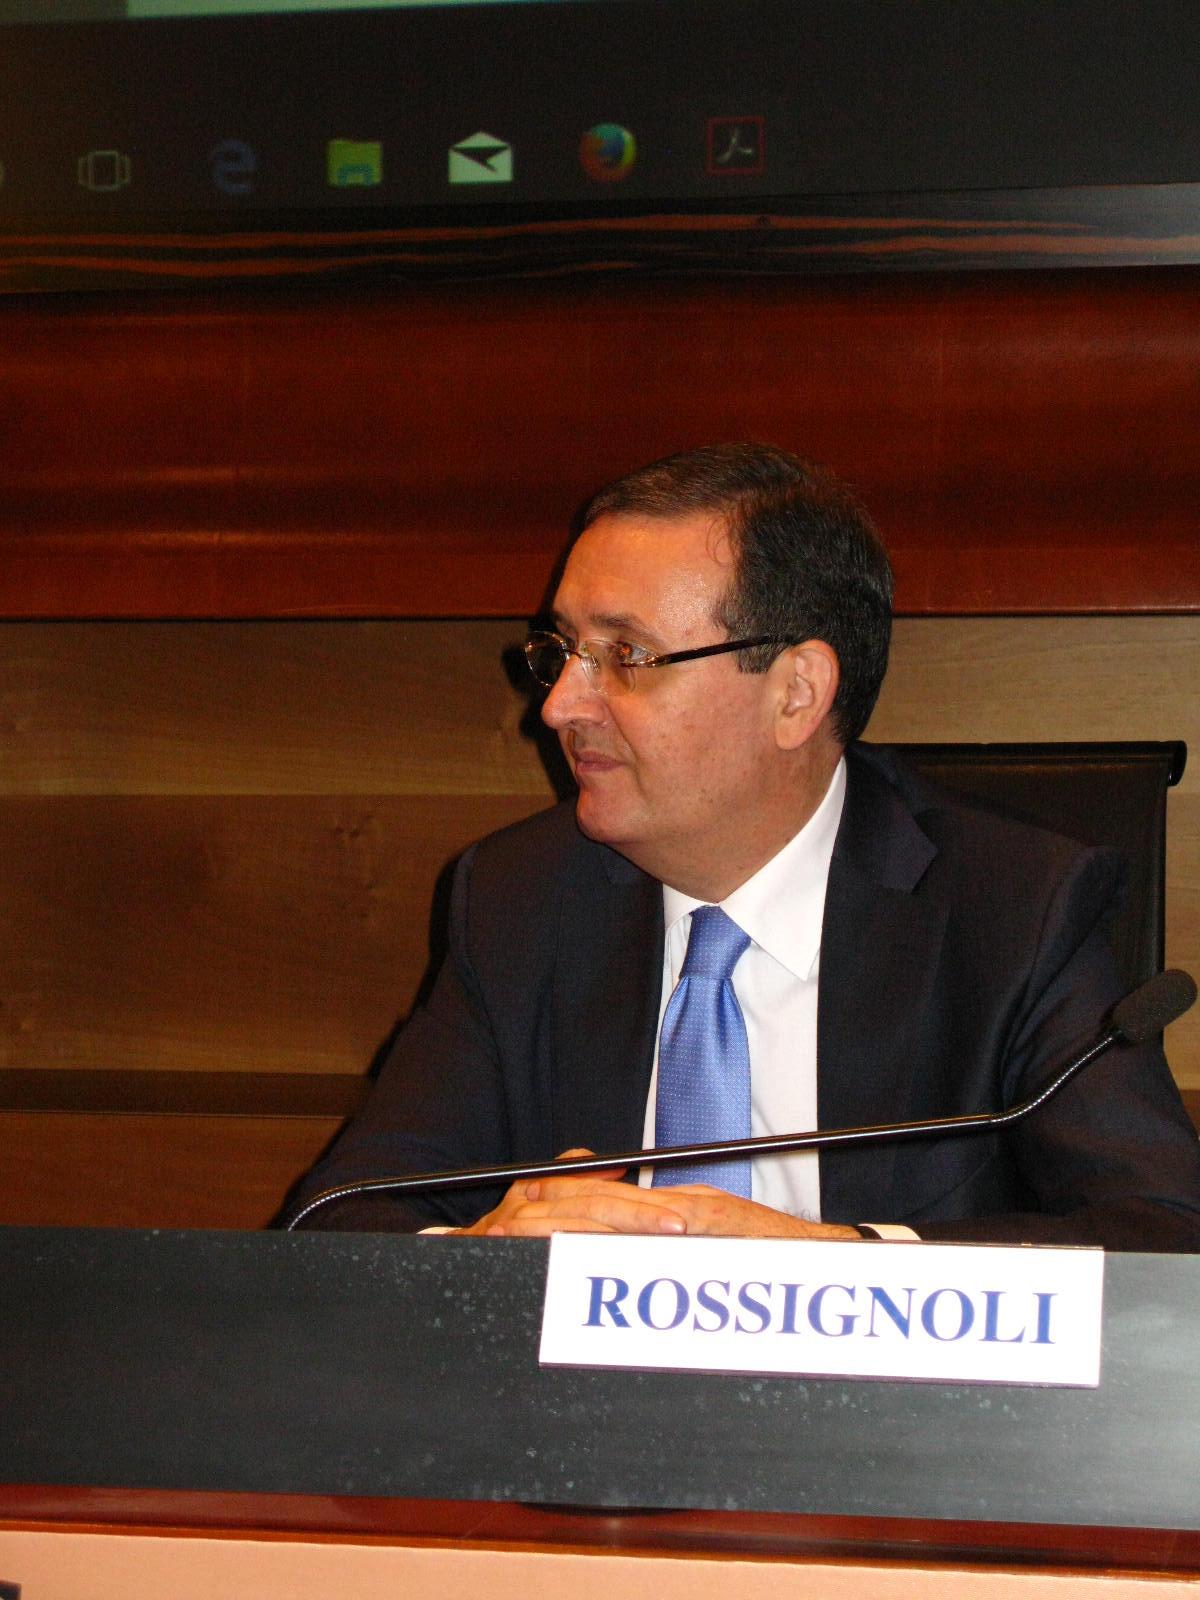 IMG 0043 Marco-Rossignoli-avvocato